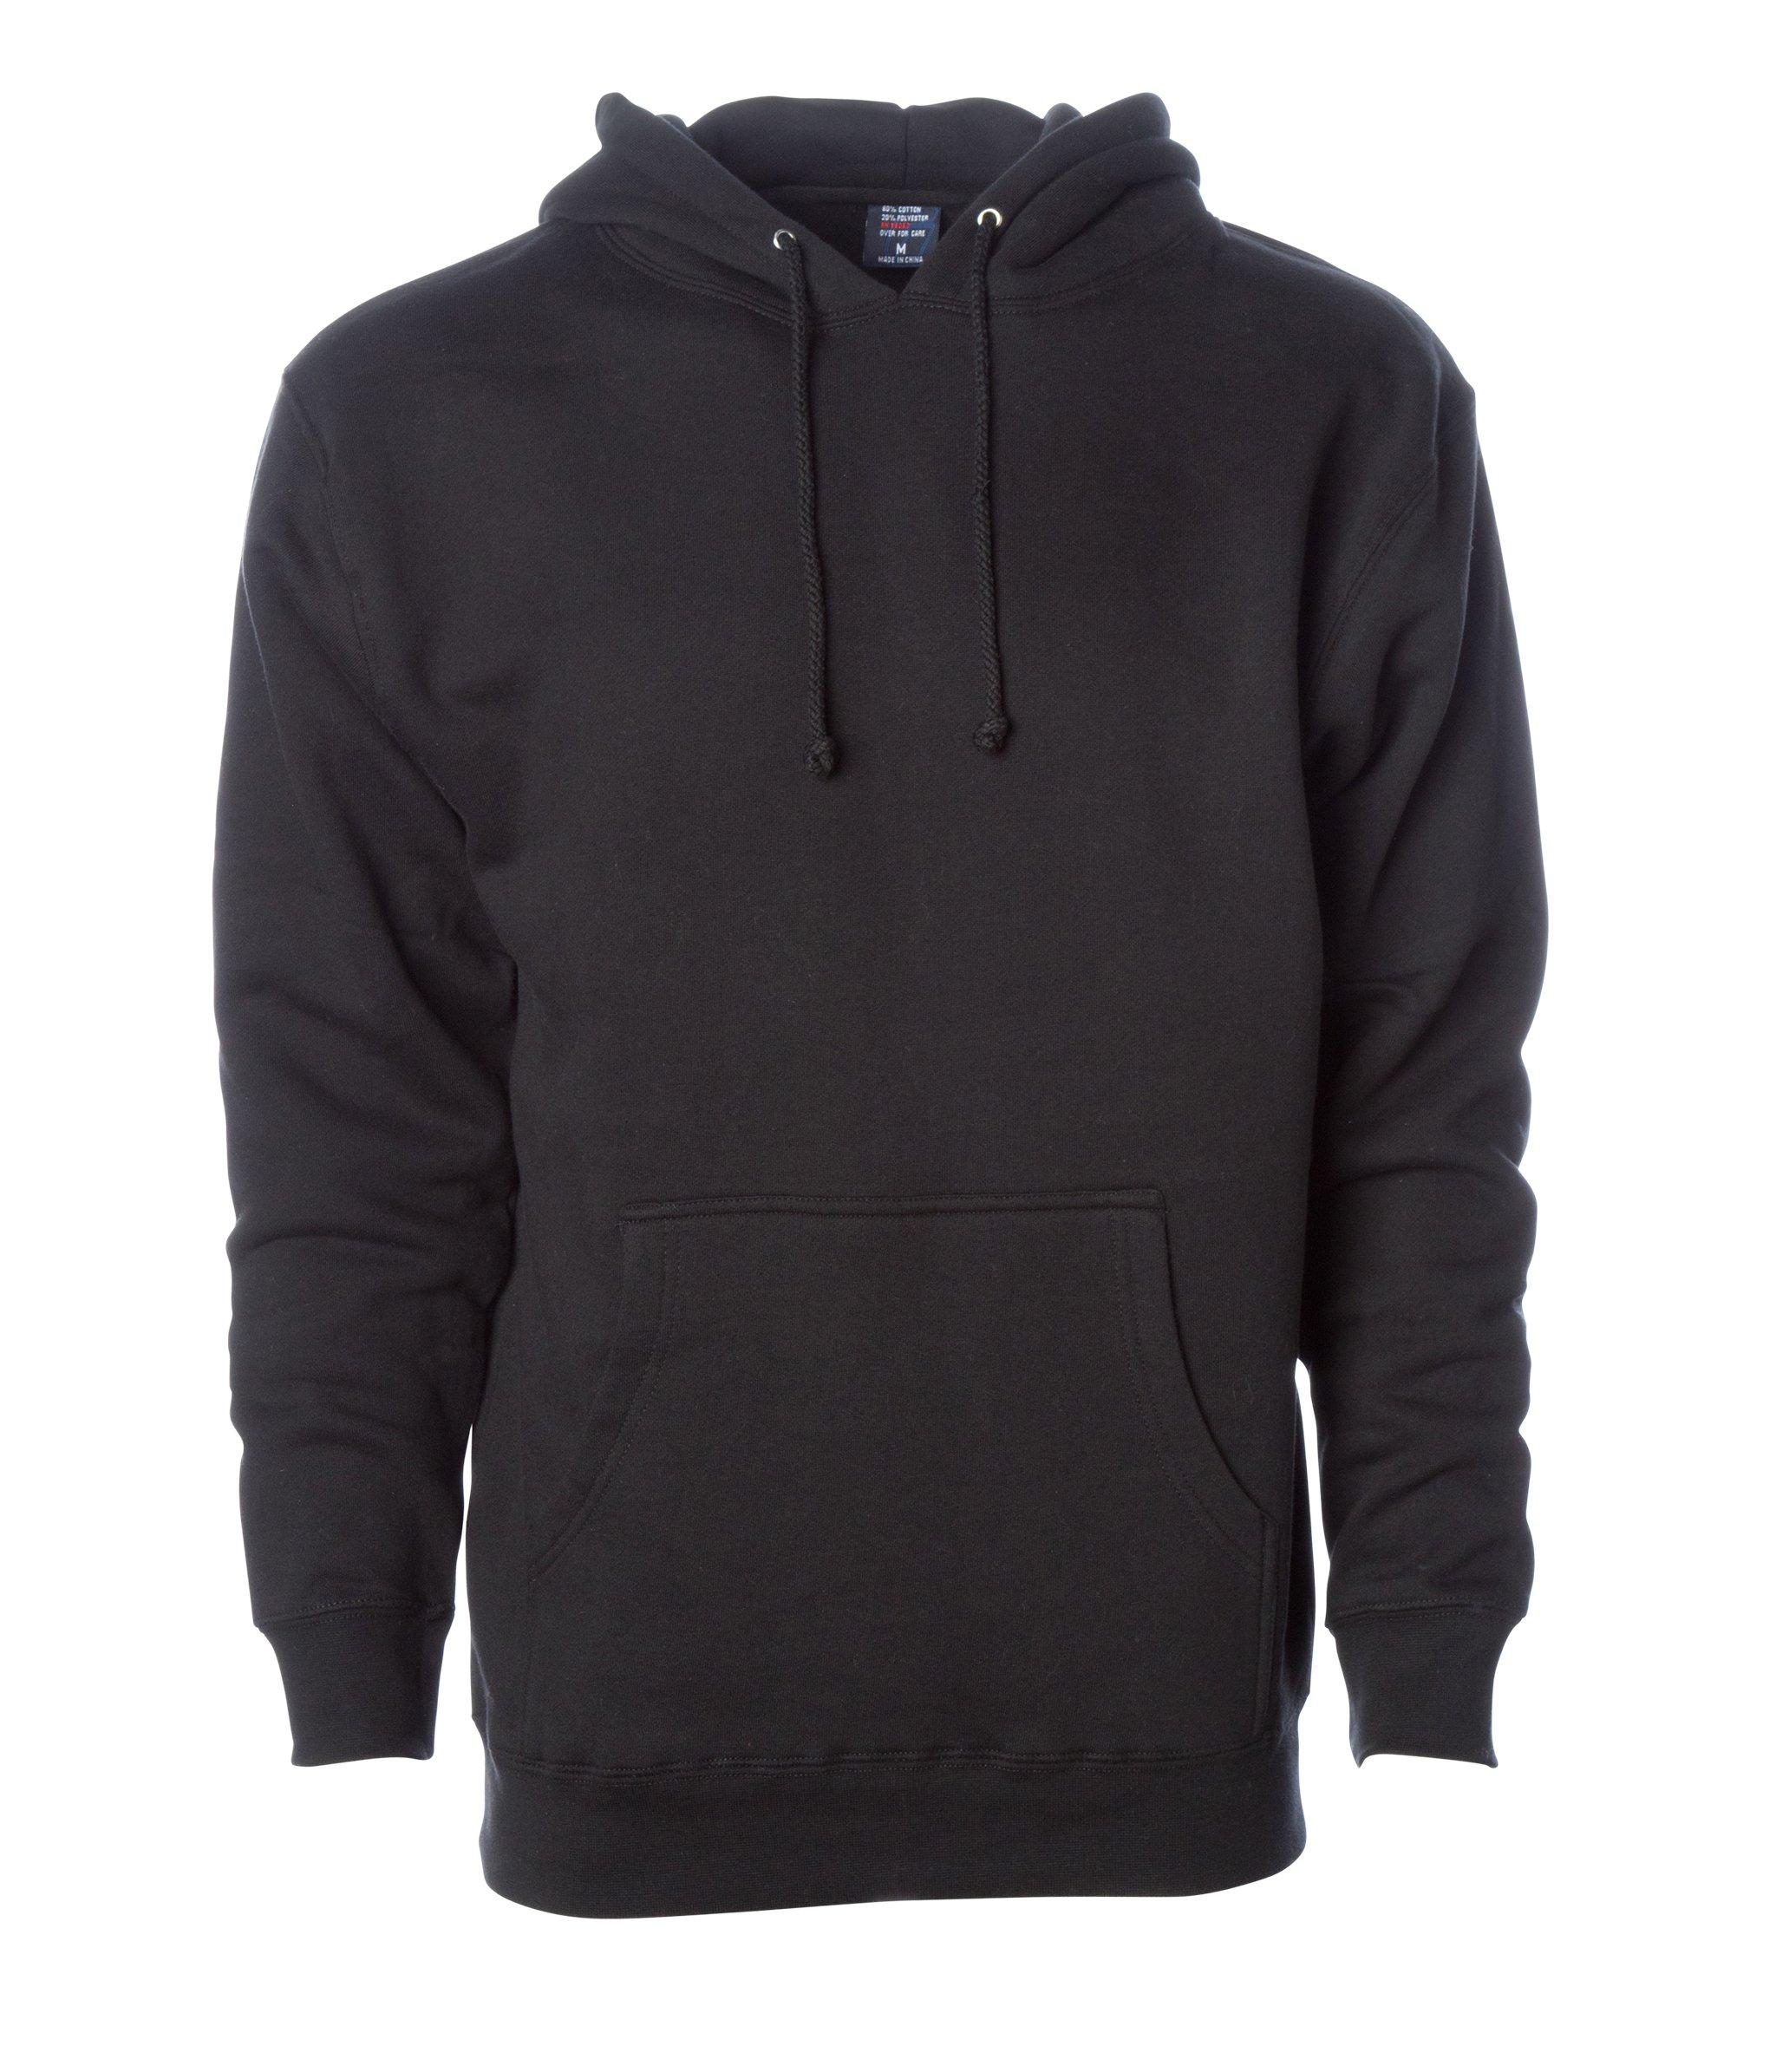 Independent Heavyweight Hooded Pullover Sweatshirt.